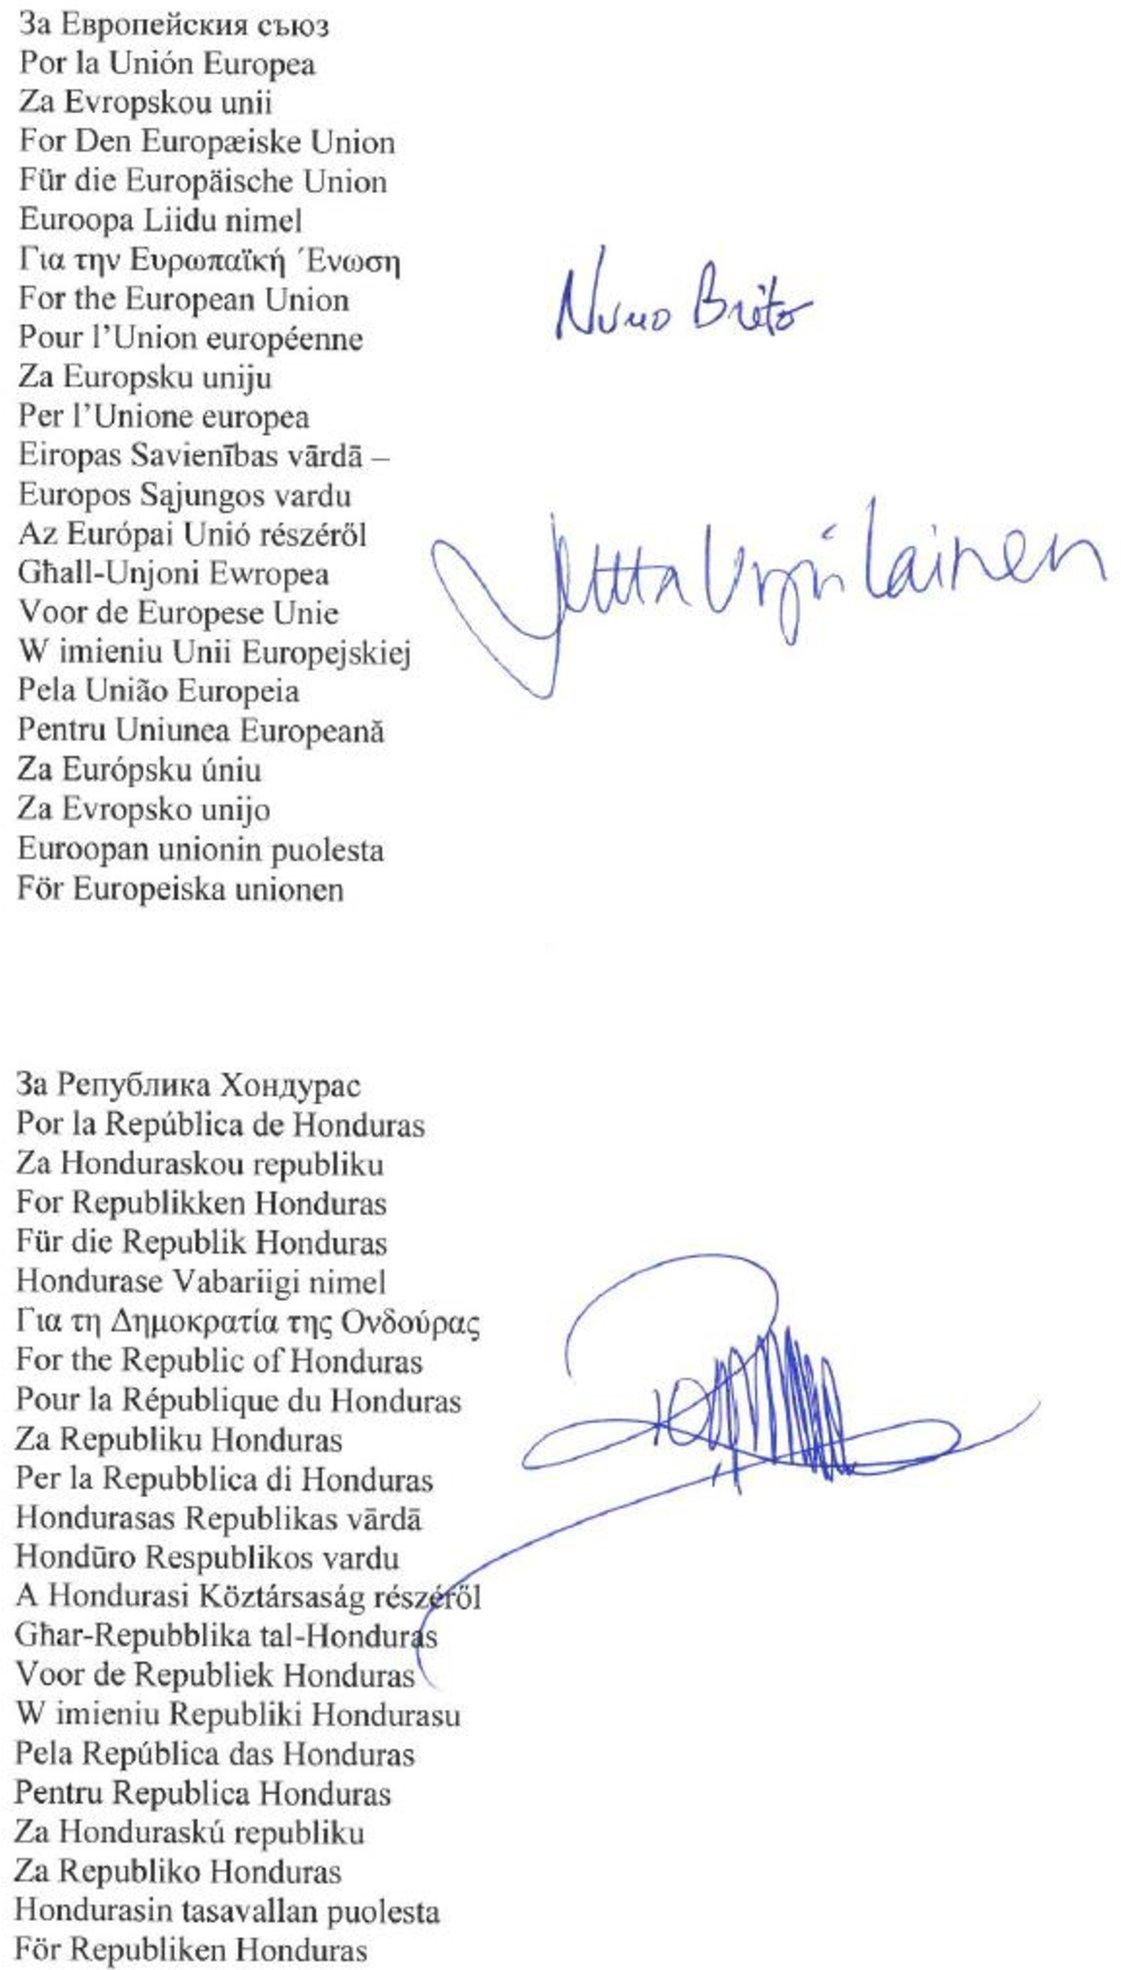 Imagen: http://publications.europa.eu/resource/uriserv/OJ.L_.2021.217.01.0003.01.SPA.xhtml.L_2021217ES.01001501.tif.jpg